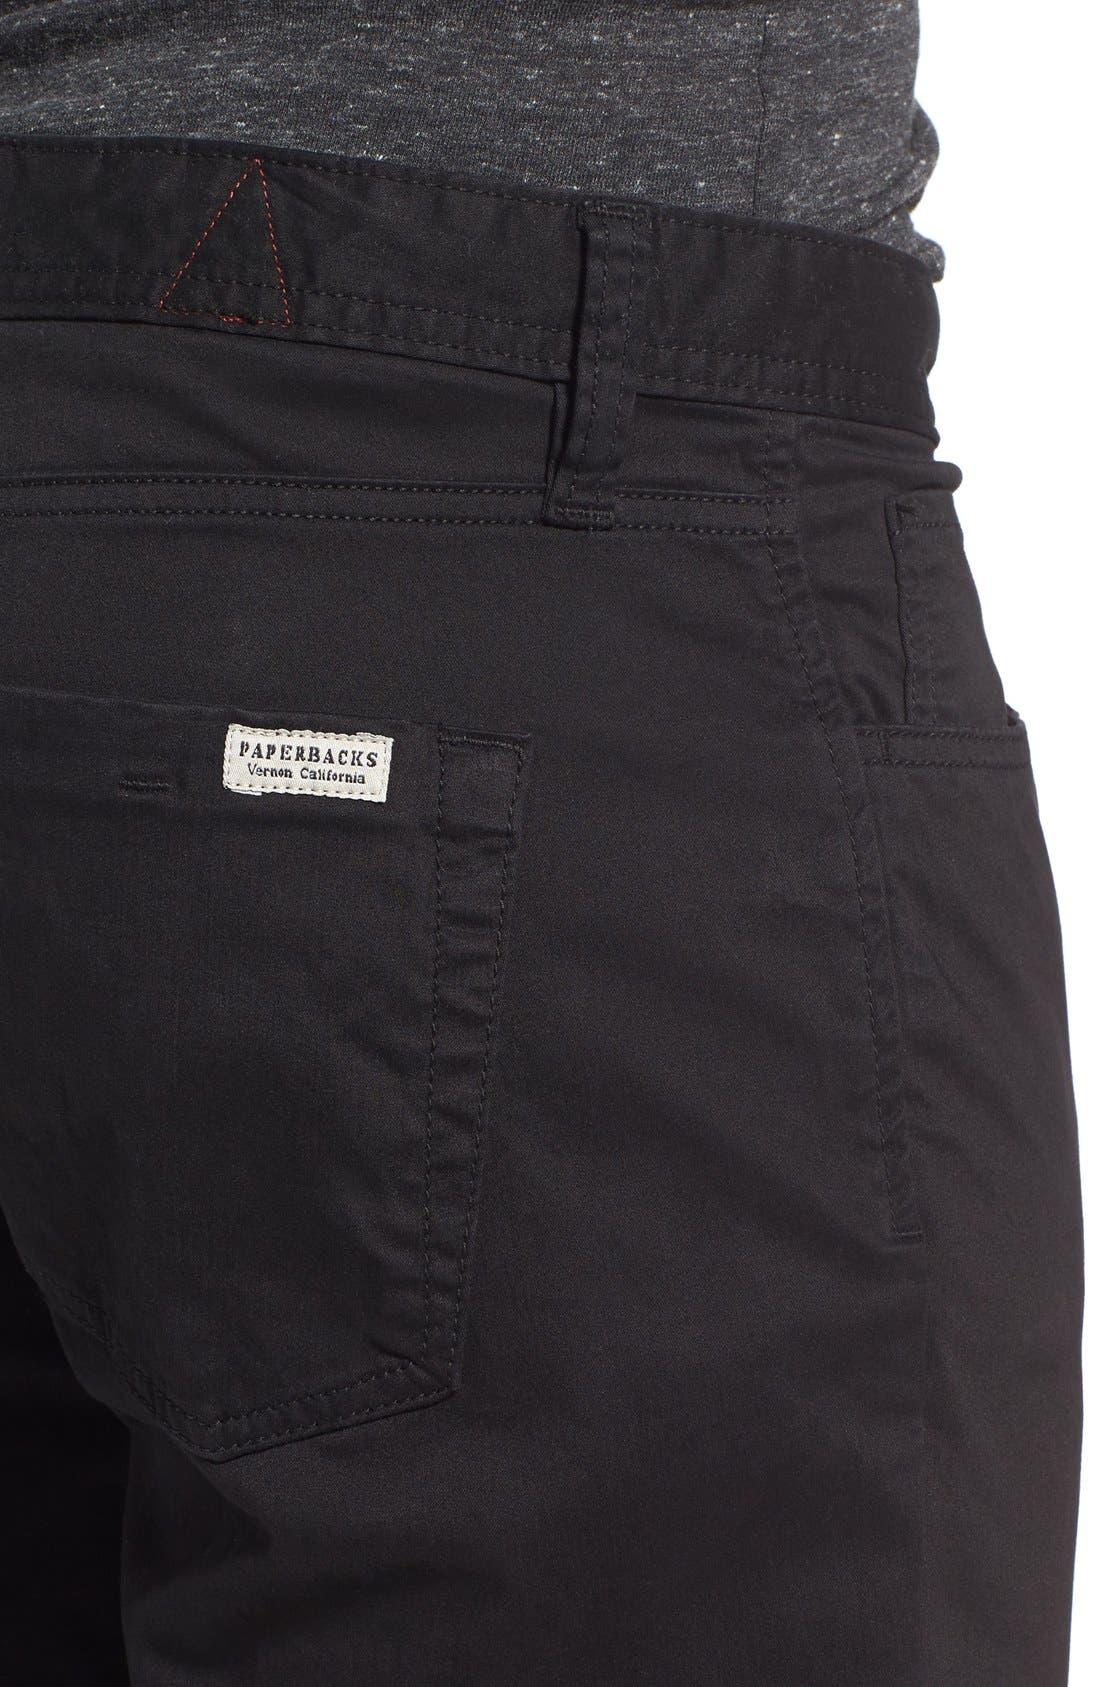 'Silverlake' Pants,                             Alternate thumbnail 4, color,                             Black